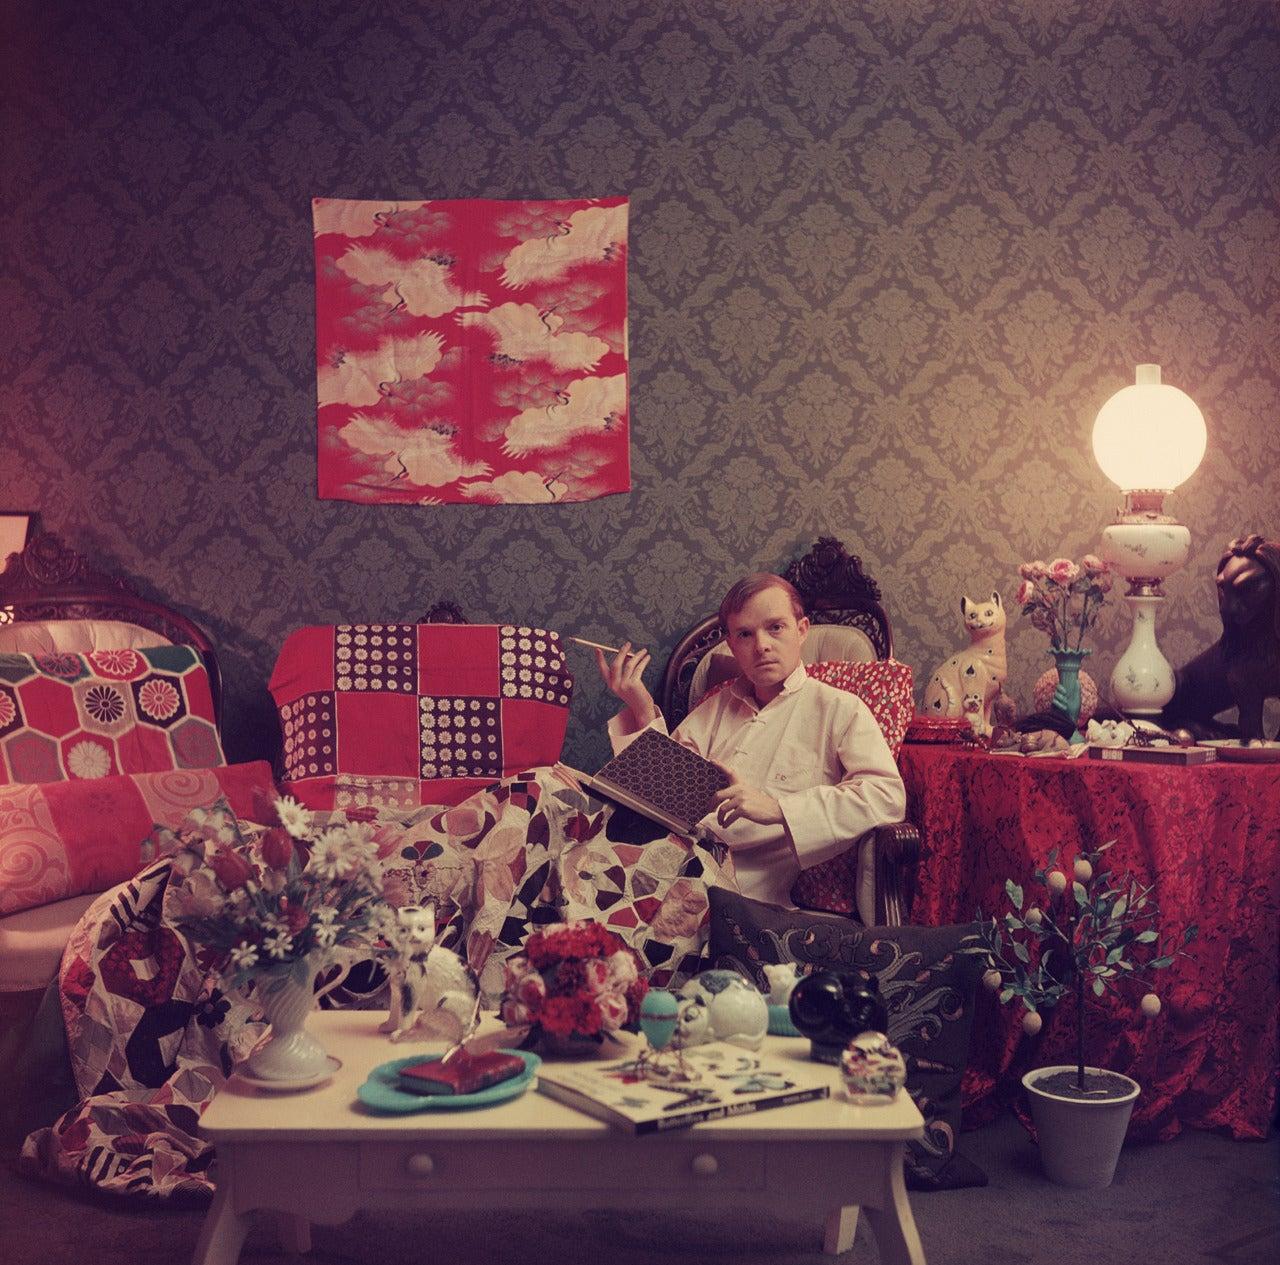 Truman Capote at Home (Slim Aarons Estate Edition)